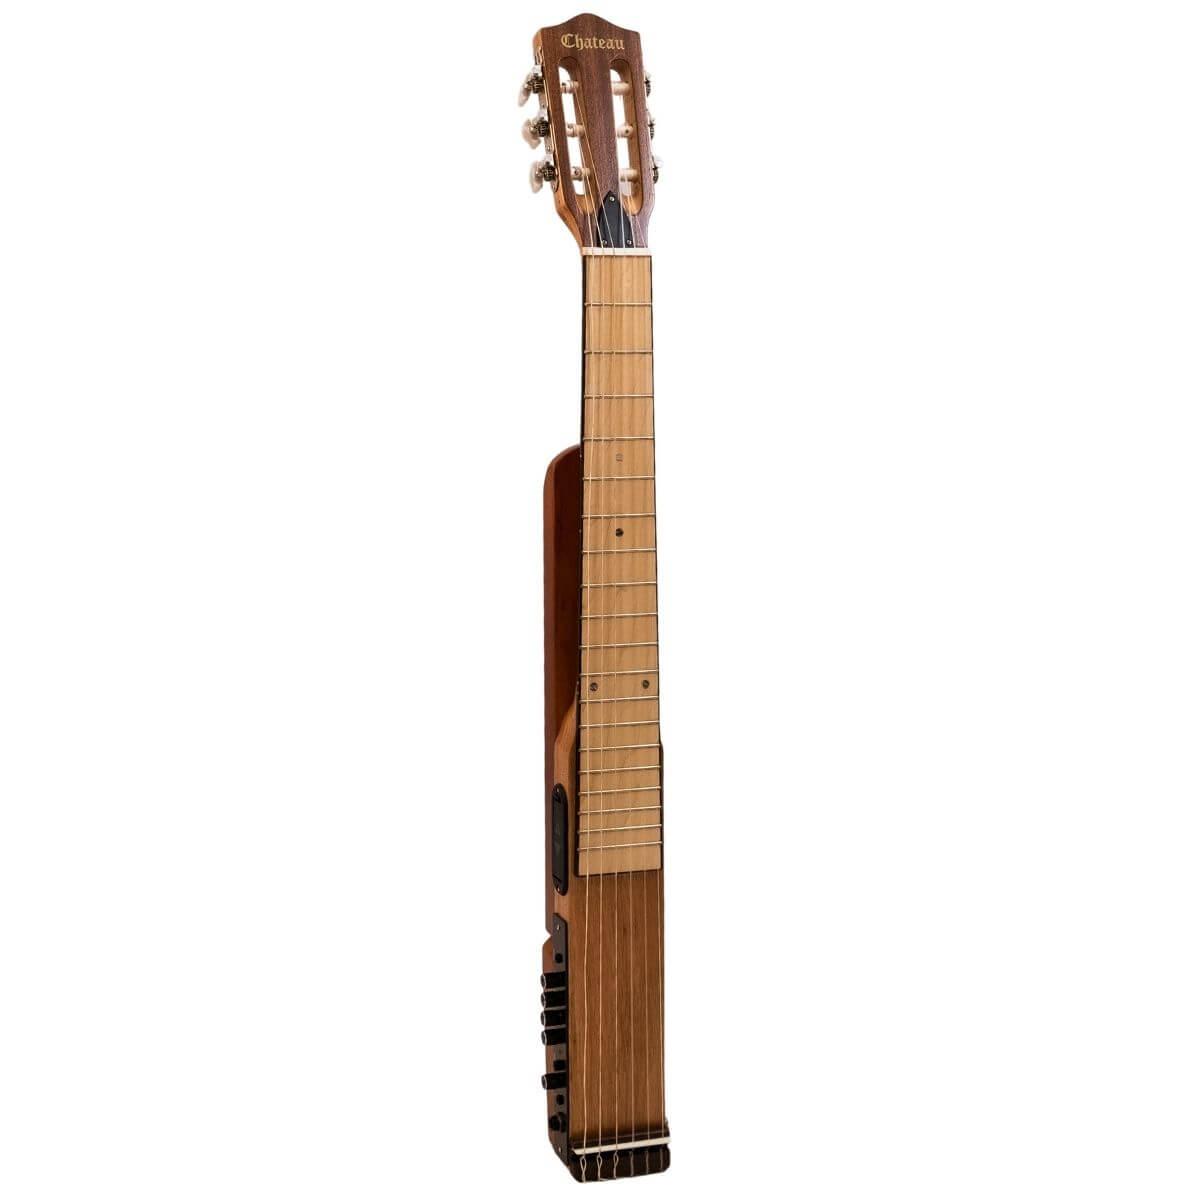 Chateau SGC-20 silent spansk guitar